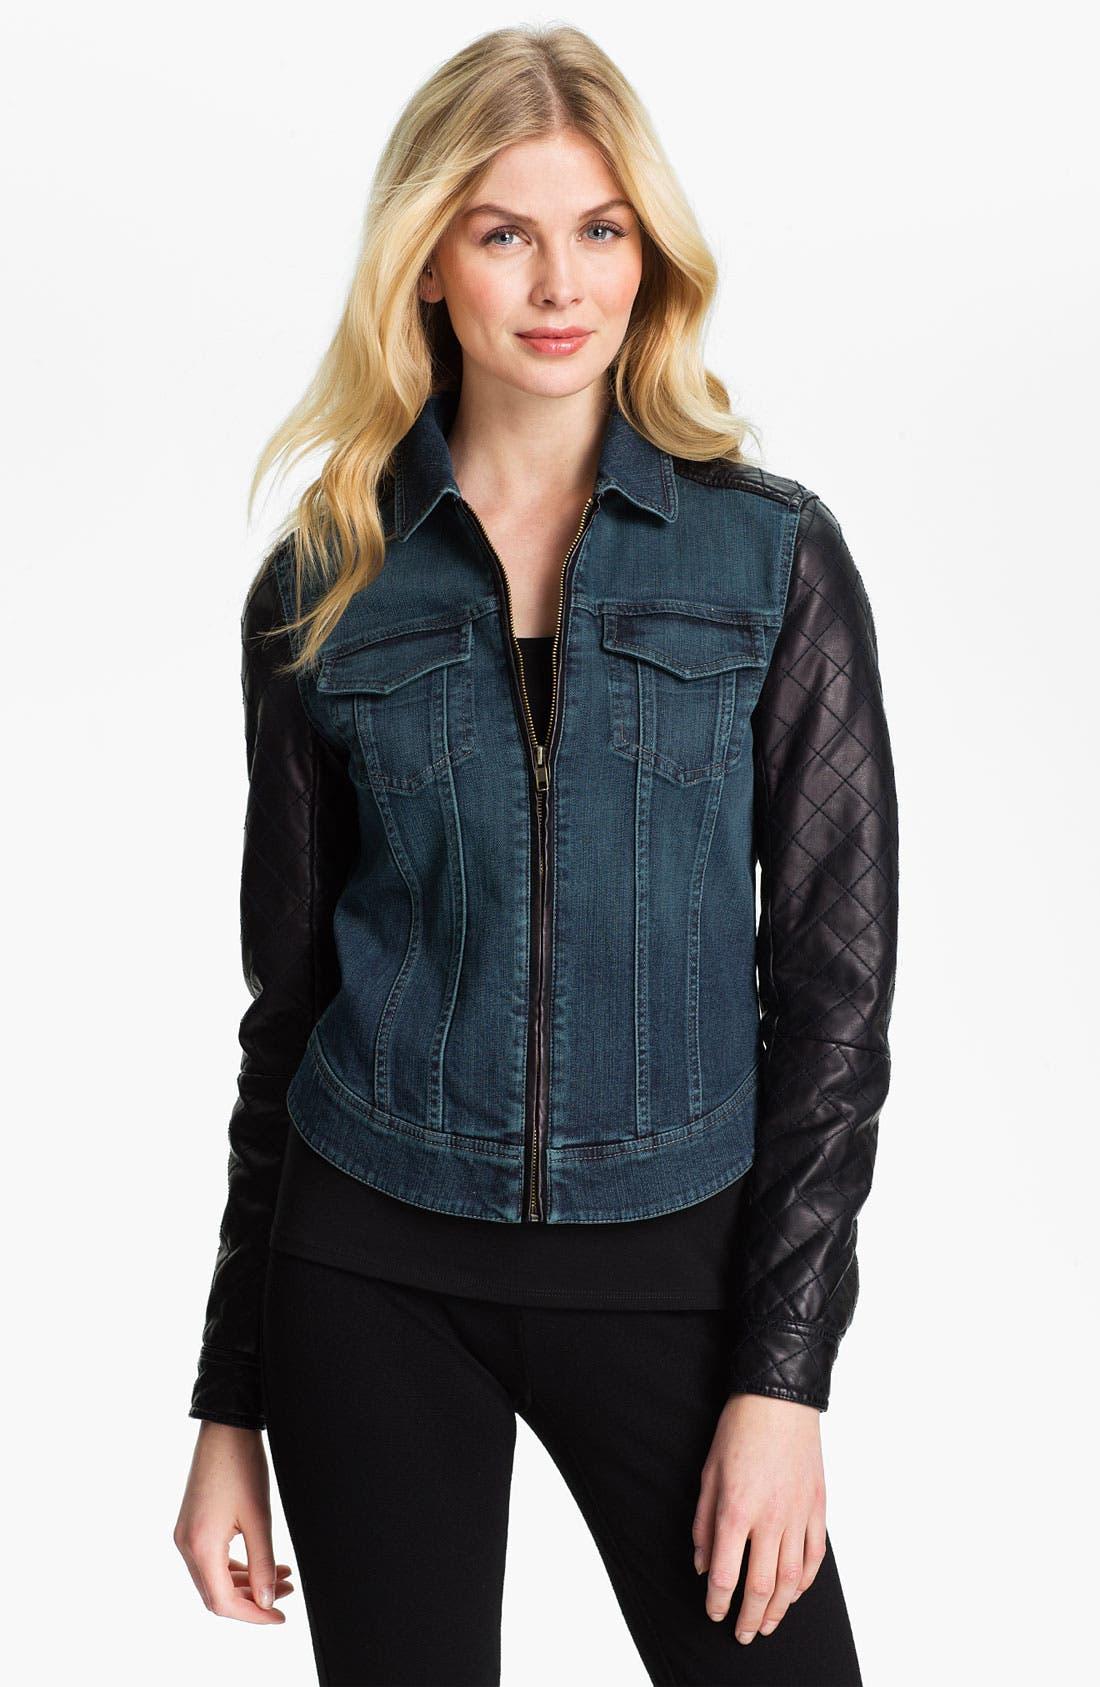 Main Image - Isaac Mizrahi Jeans 'Kimberly' Mix Media Jacket (Online Exclusive)